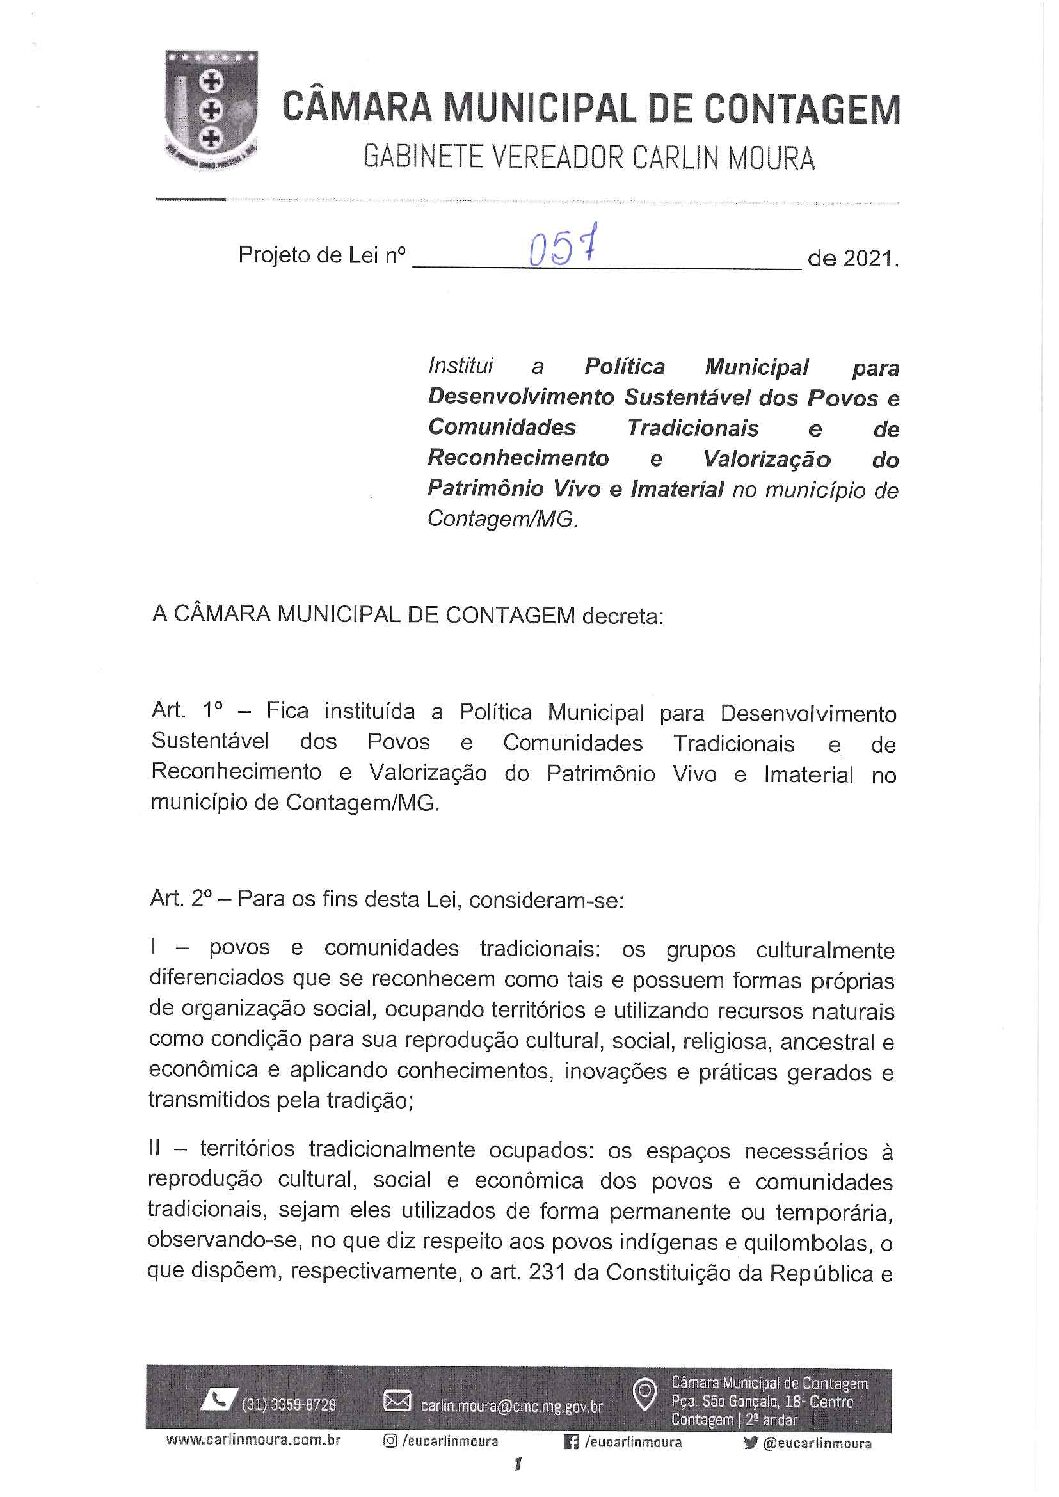 Projeto de lei 0057/2021